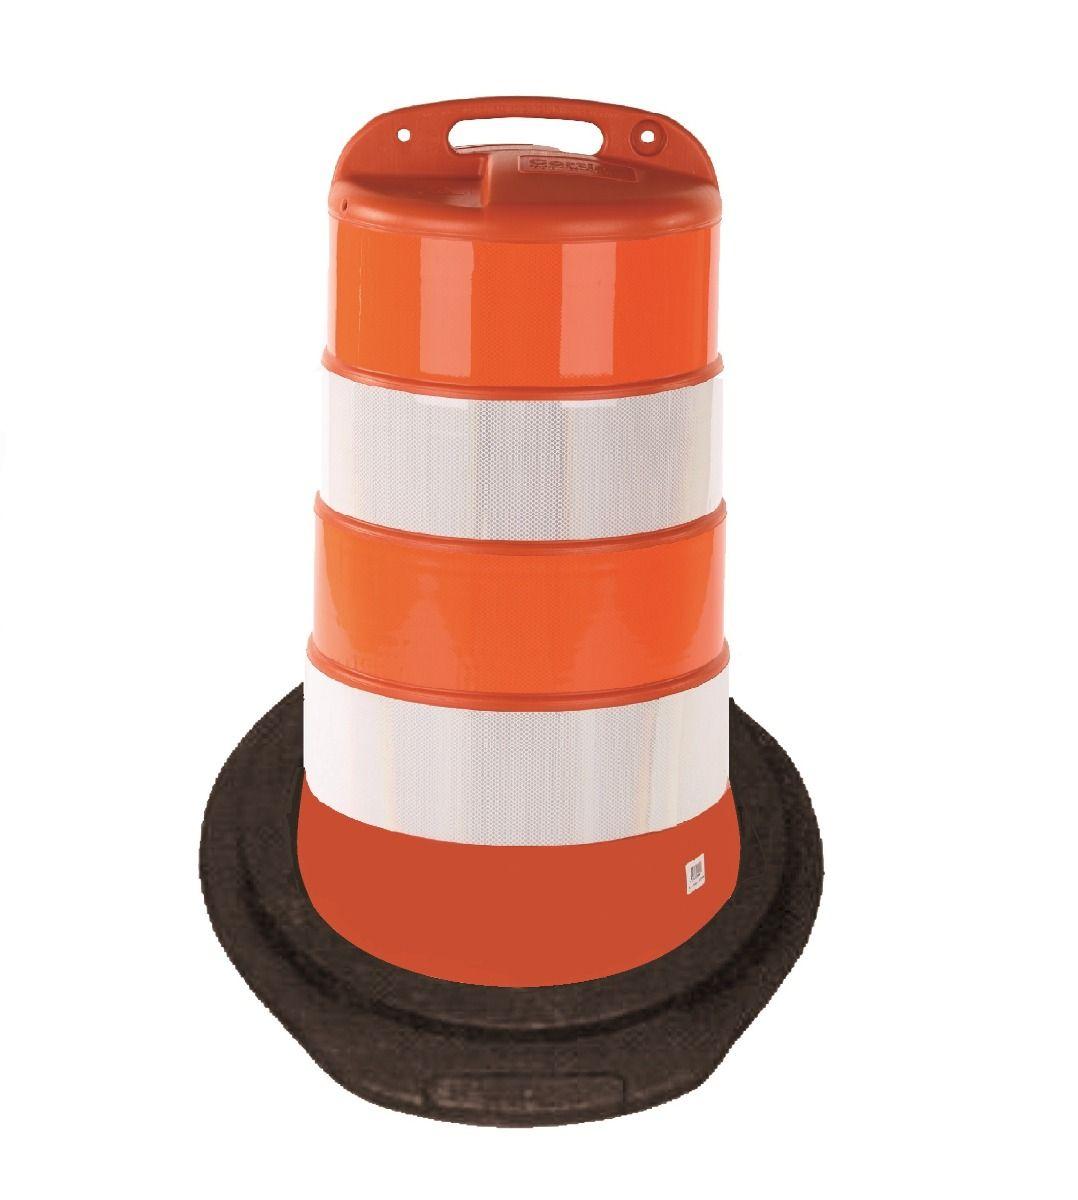 Channelizer Cones